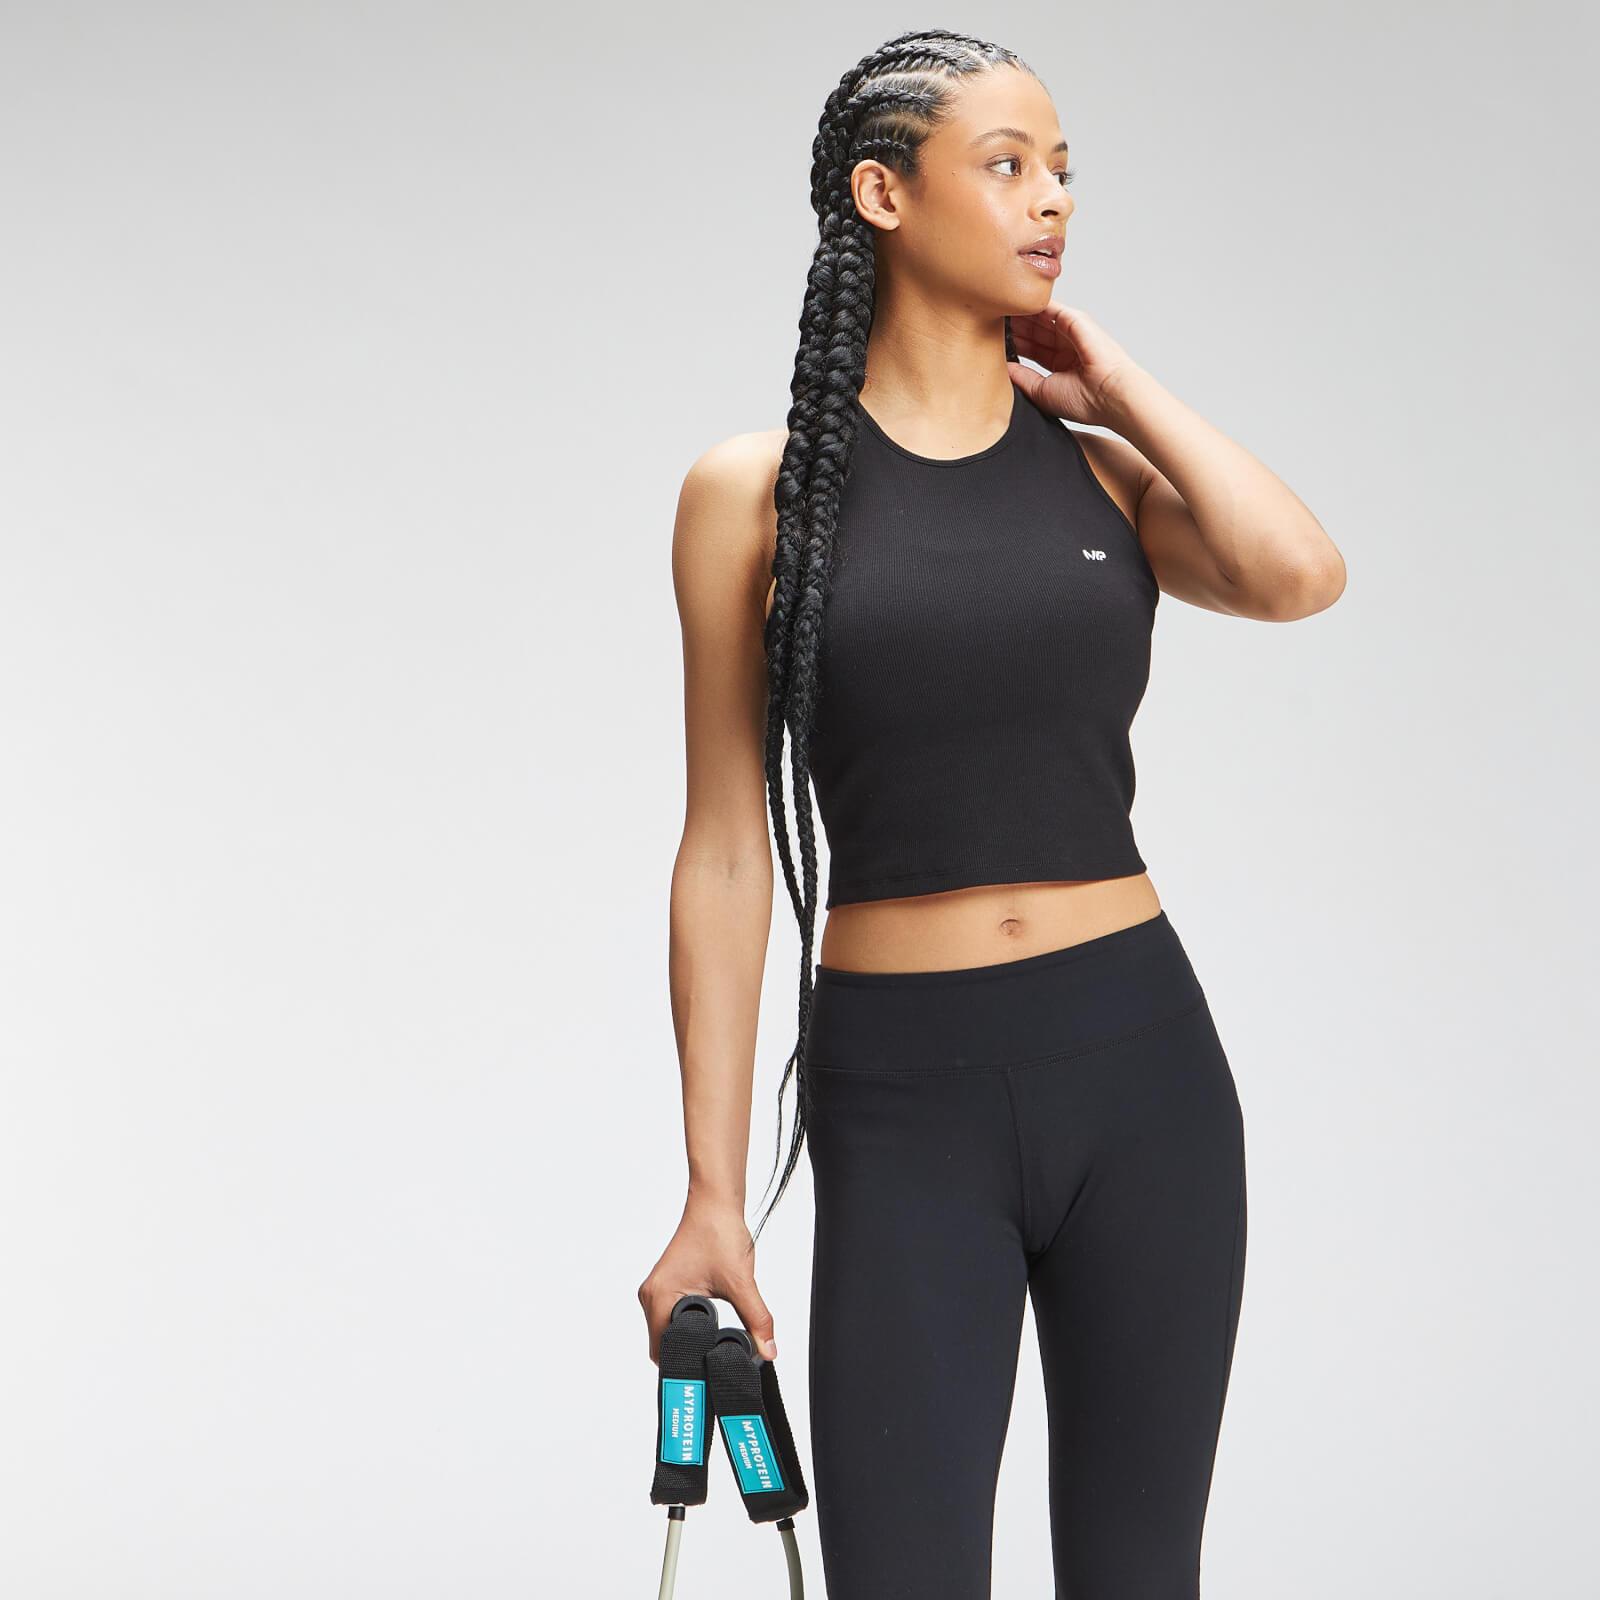 Купить MP Women's Essential Cropped Rib Vest - Black - XL, Myprotein International